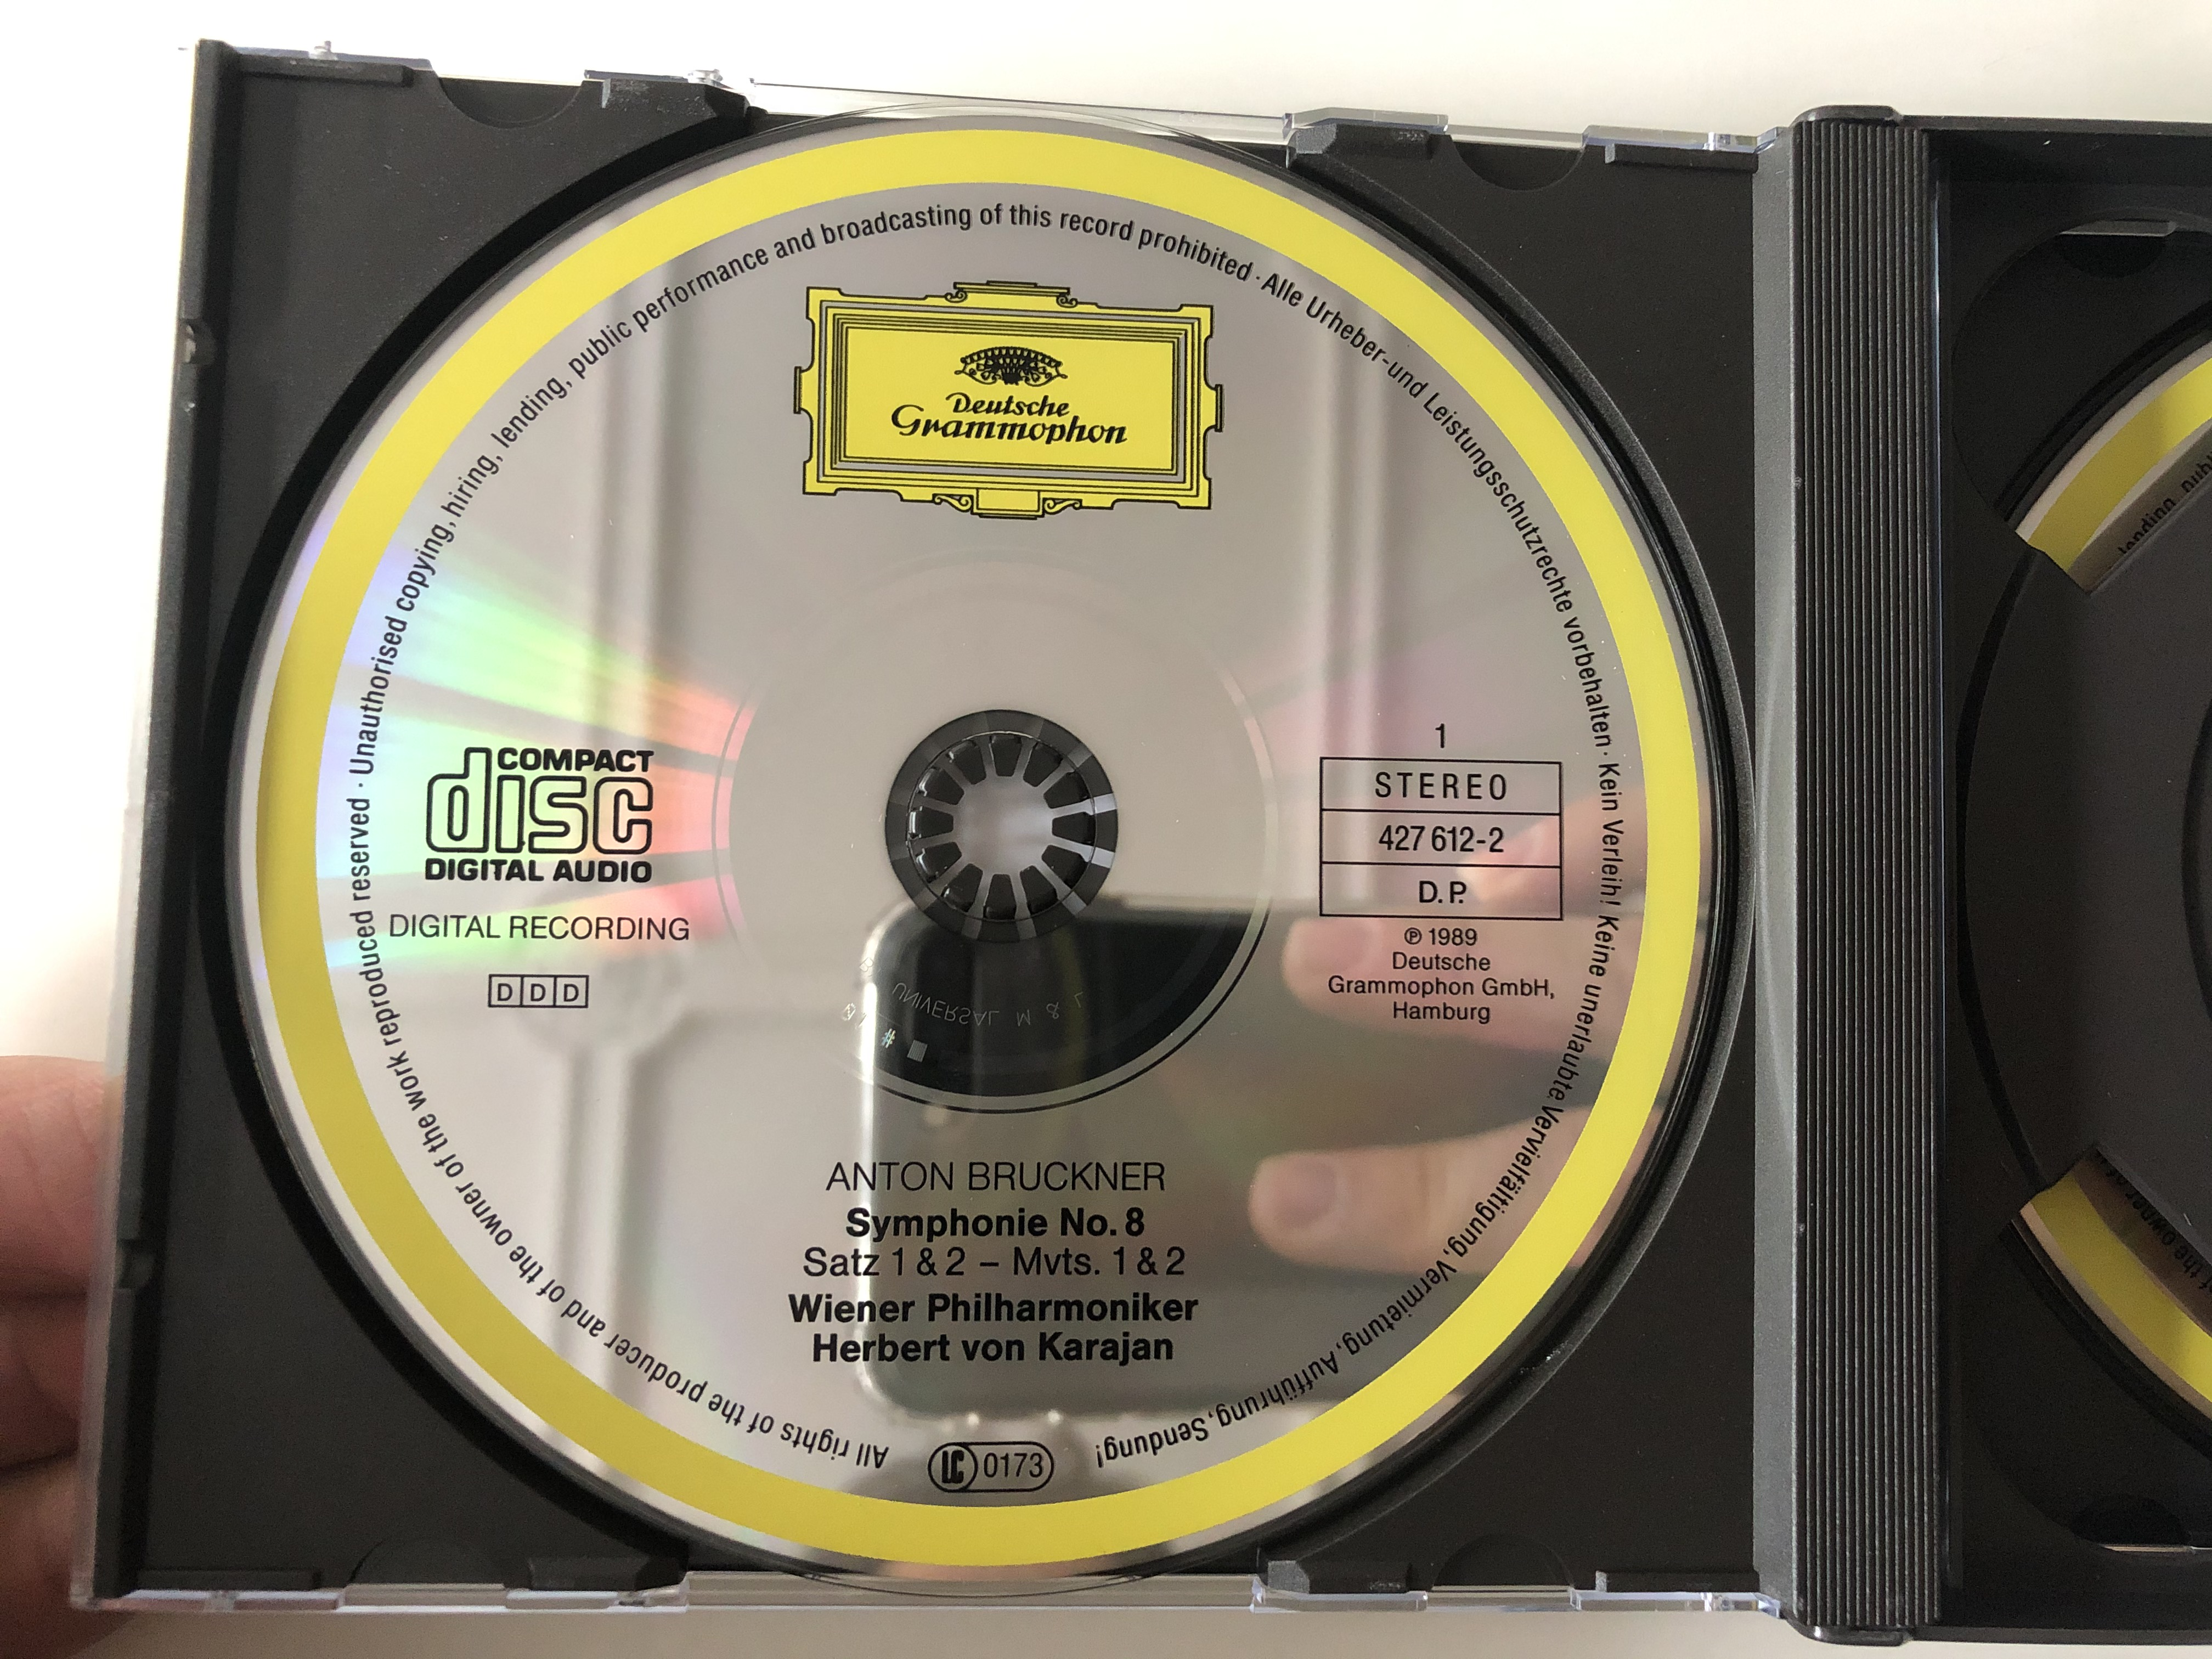 anton-bruckner-symphonie-no.-8-wiener-philharmoniker-herbert-von-karajan-deutsche-grammophon-2x-audio-cd-1989-stereo-427-611-2-2-.jpg